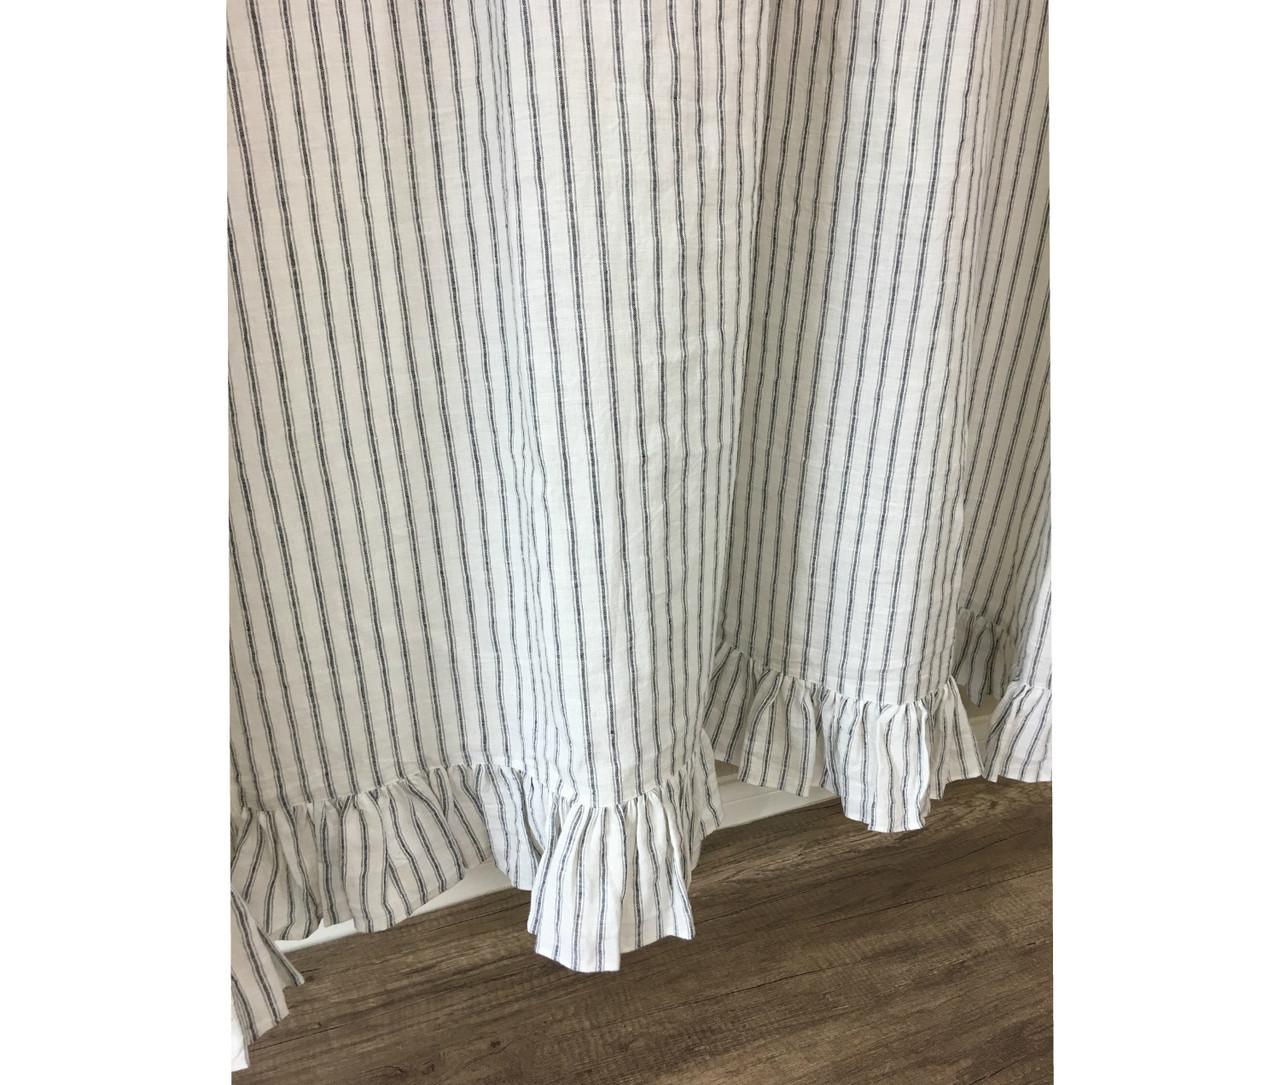 Iron And White Ticking Stripe Linen Shower Curtain With Ruffle Hem